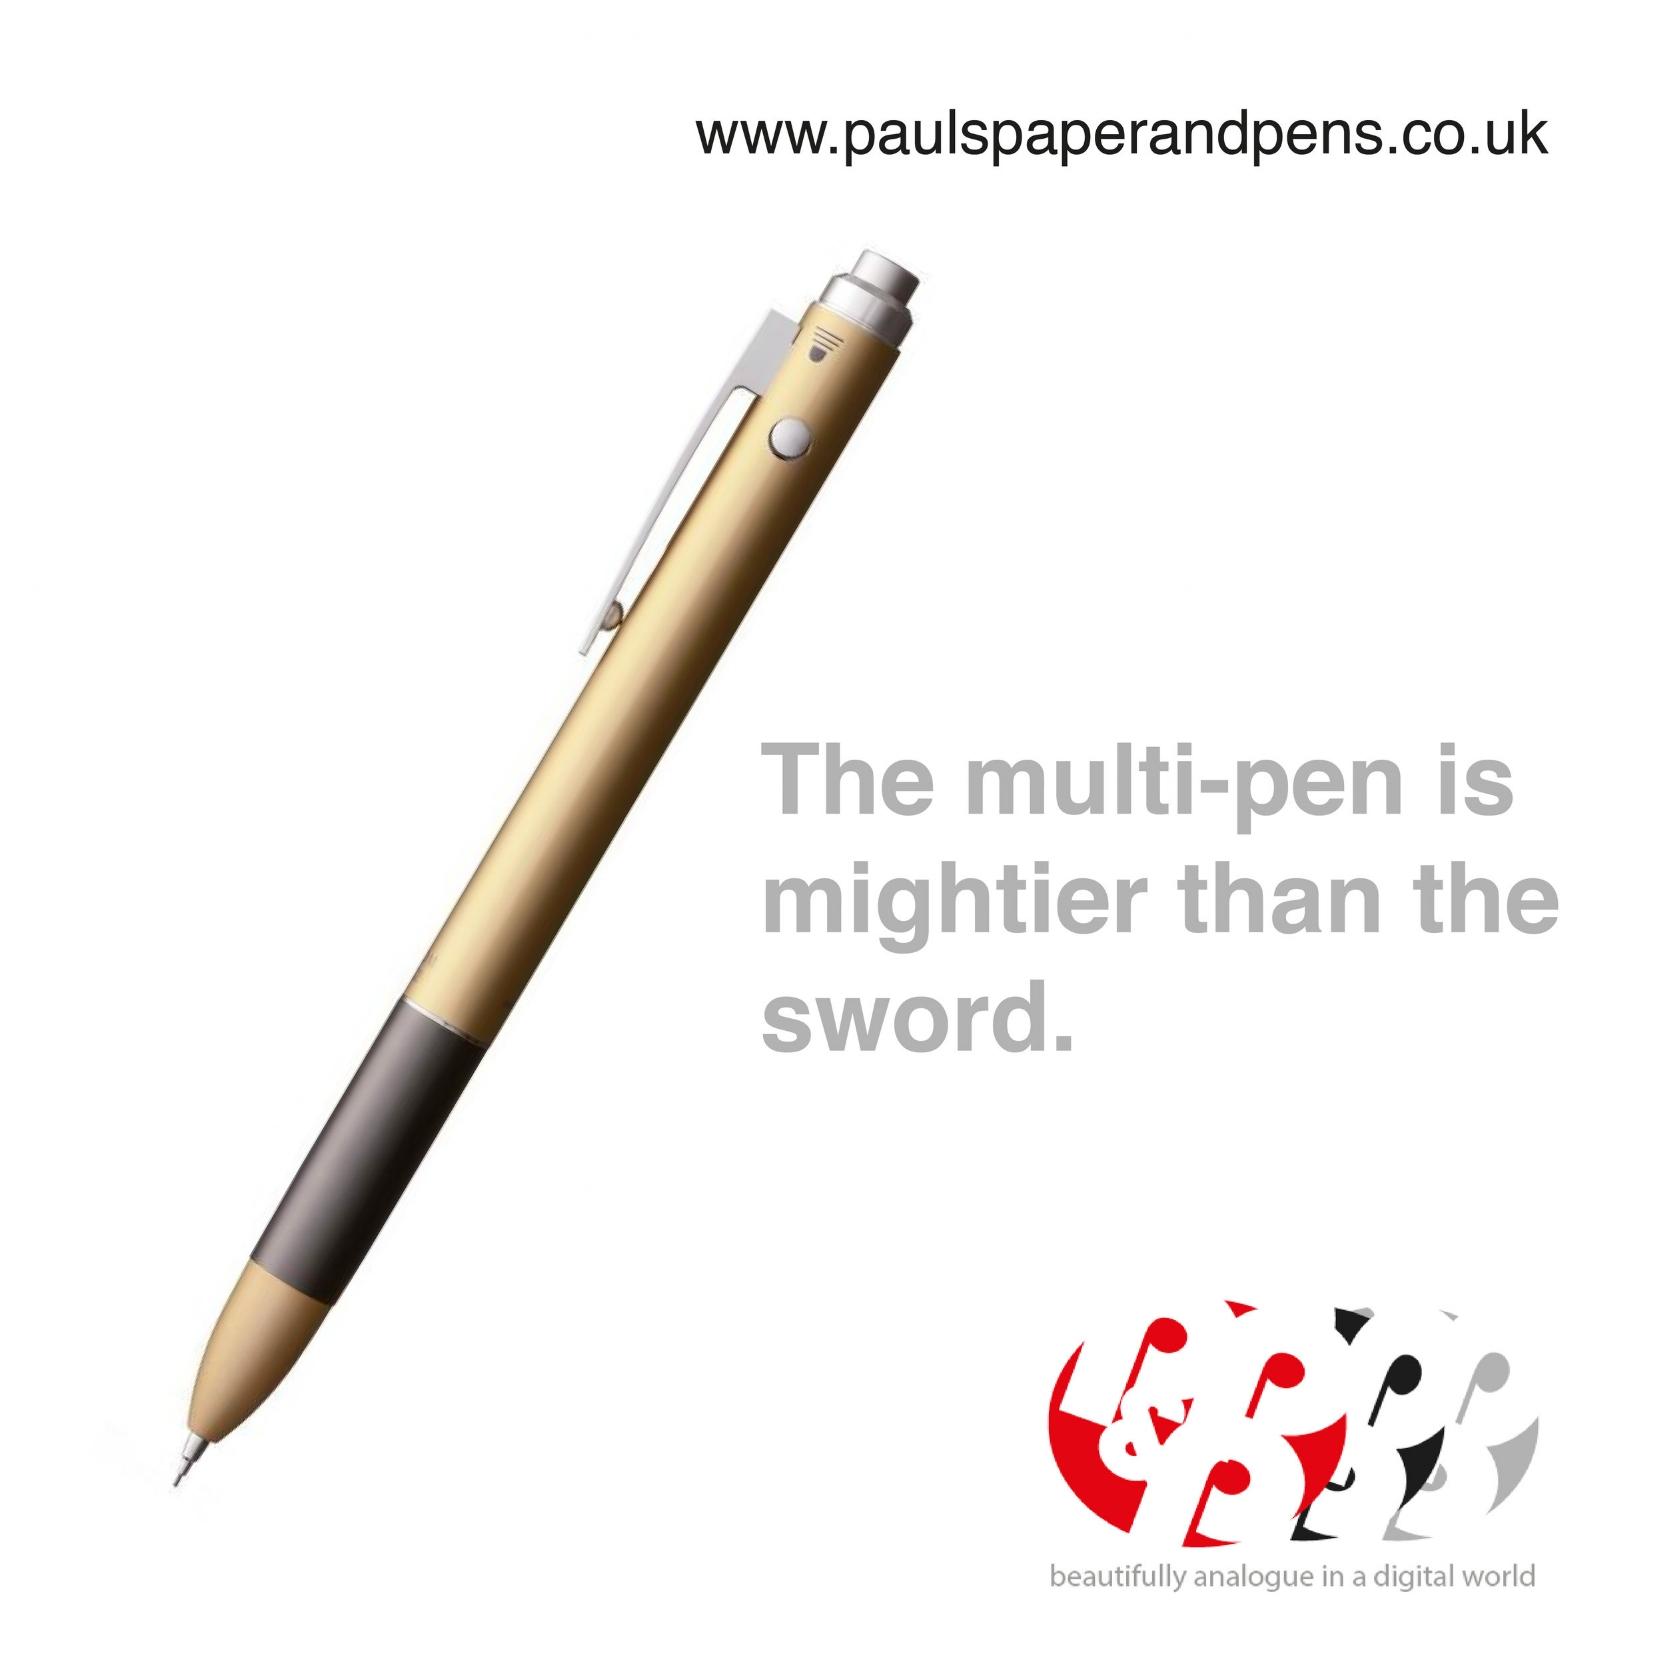 Pauls-Paper-Pens-Multi-Pen-Discount